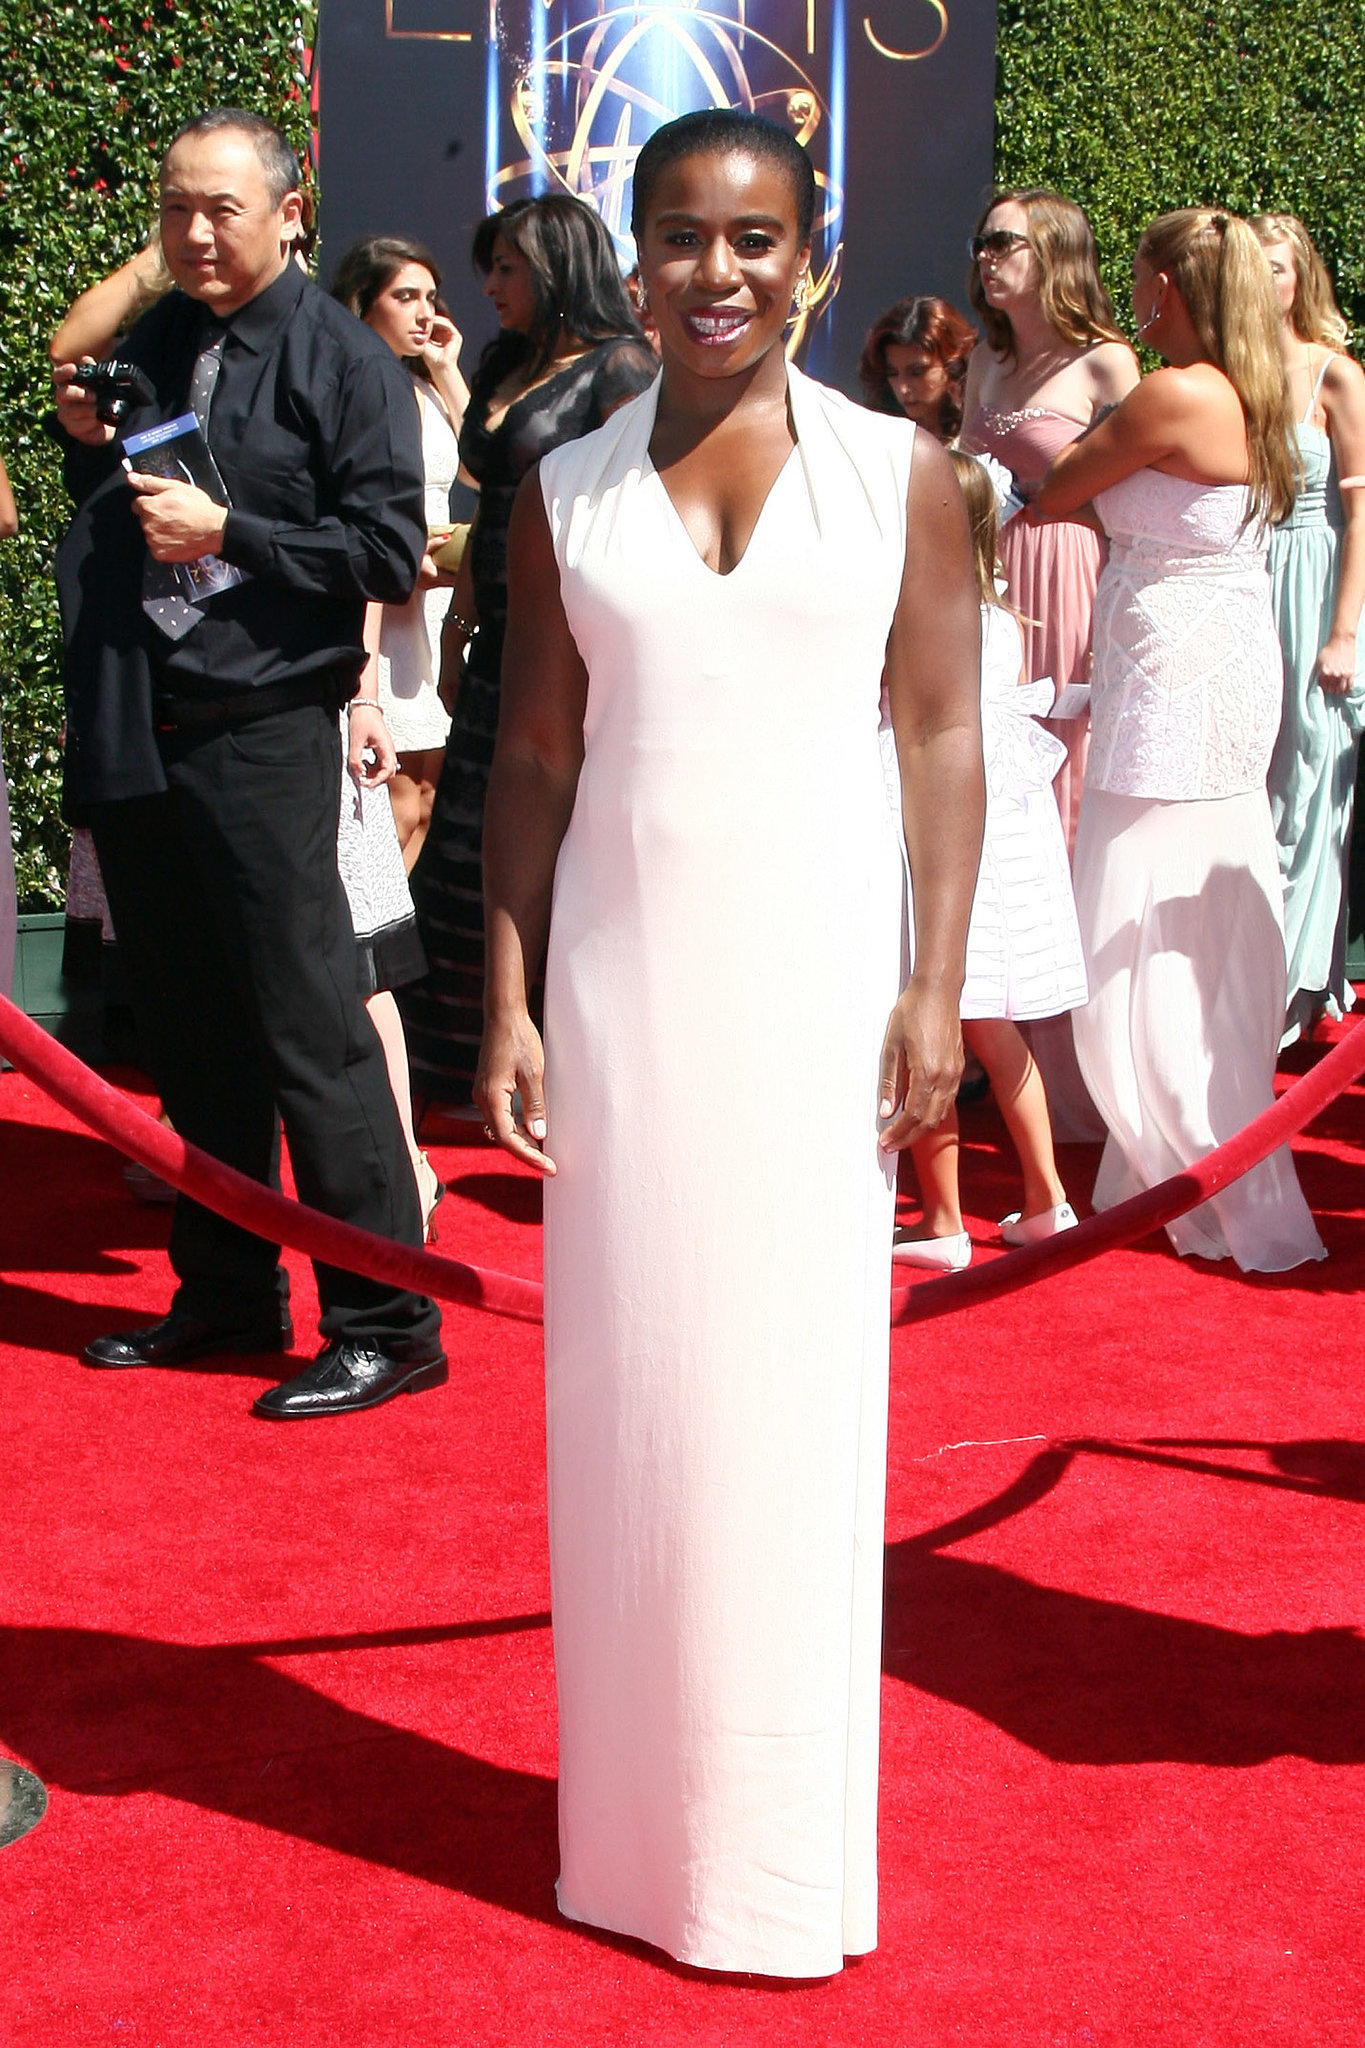 Uzo Aduba stunned in a white dress.